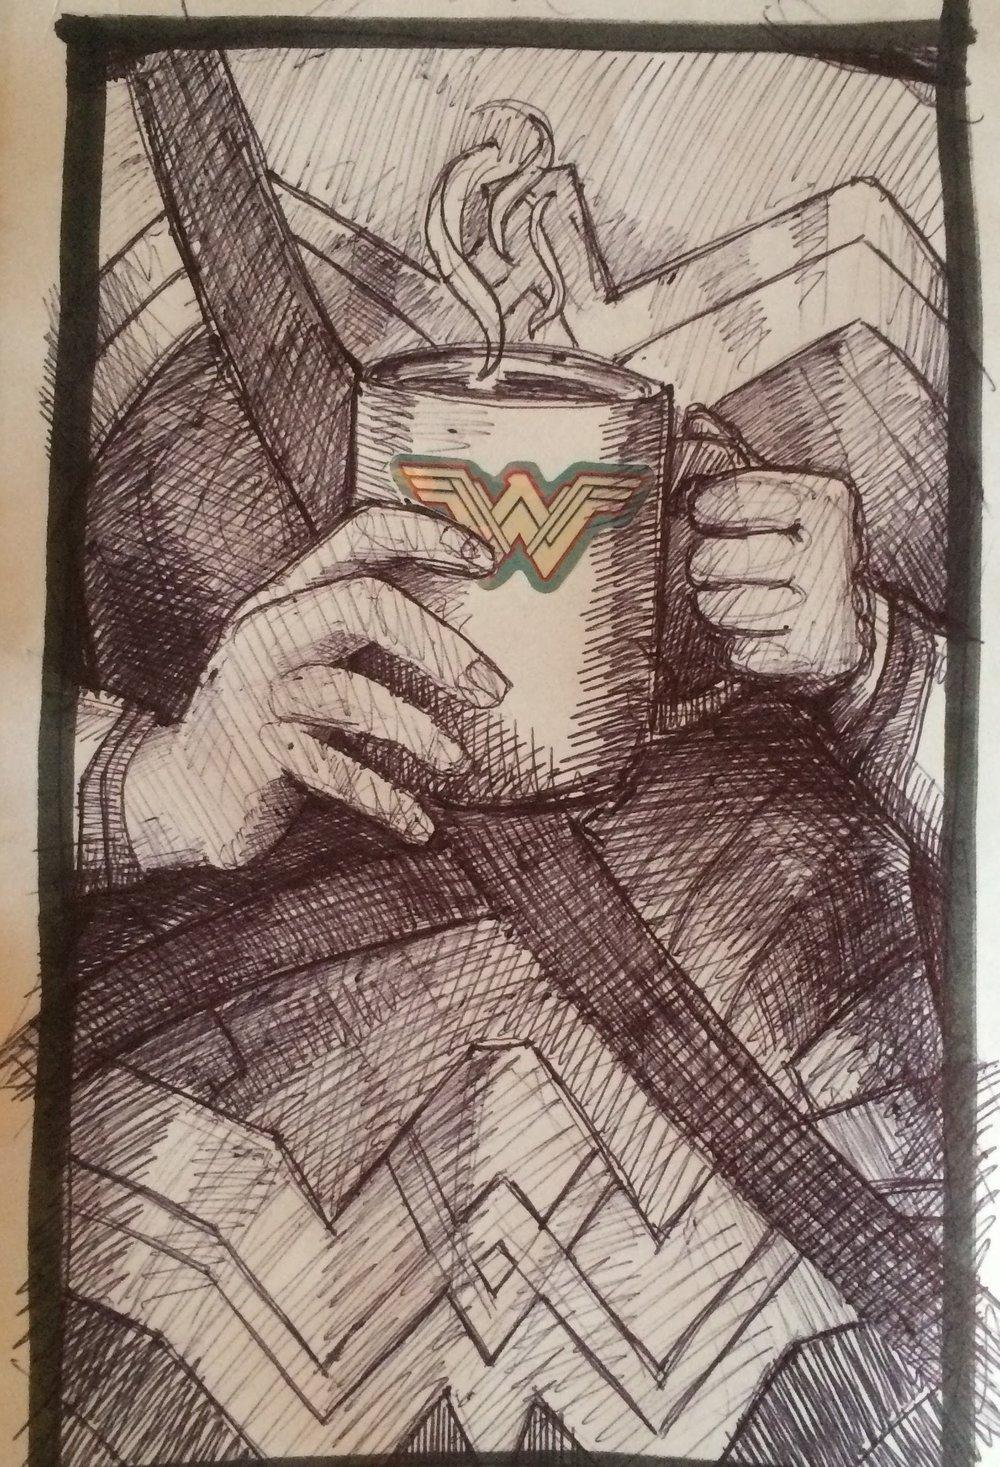 43. September 5, 2017 - Coffee.